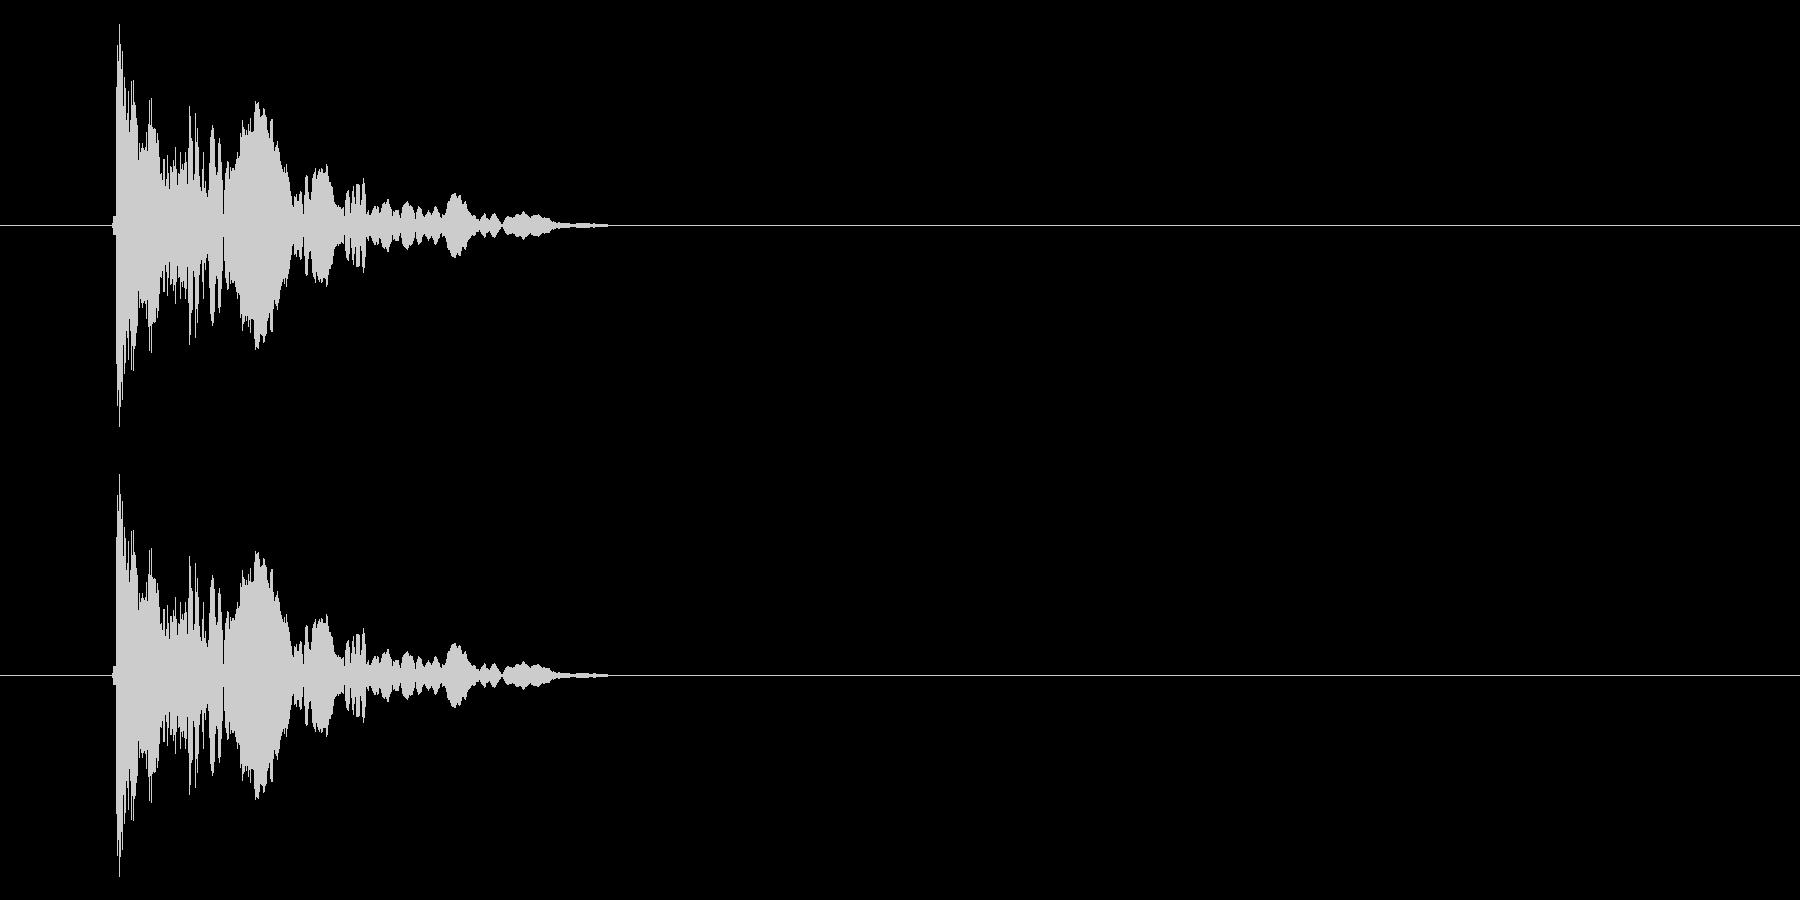 SNES 野球01-01(金属バット)の未再生の波形